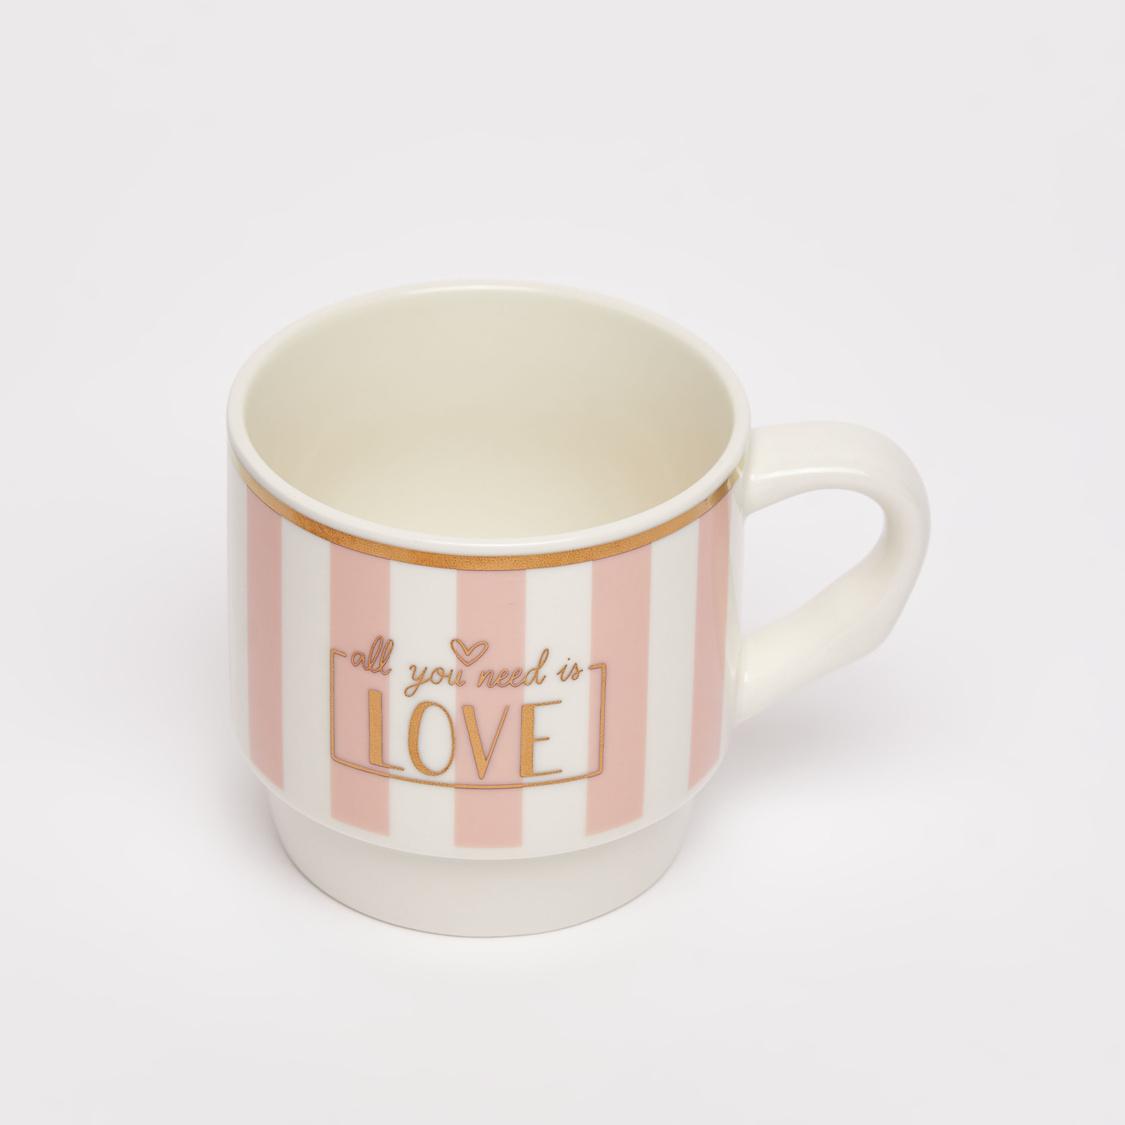 Set of 2 - Striped Mug with Handle